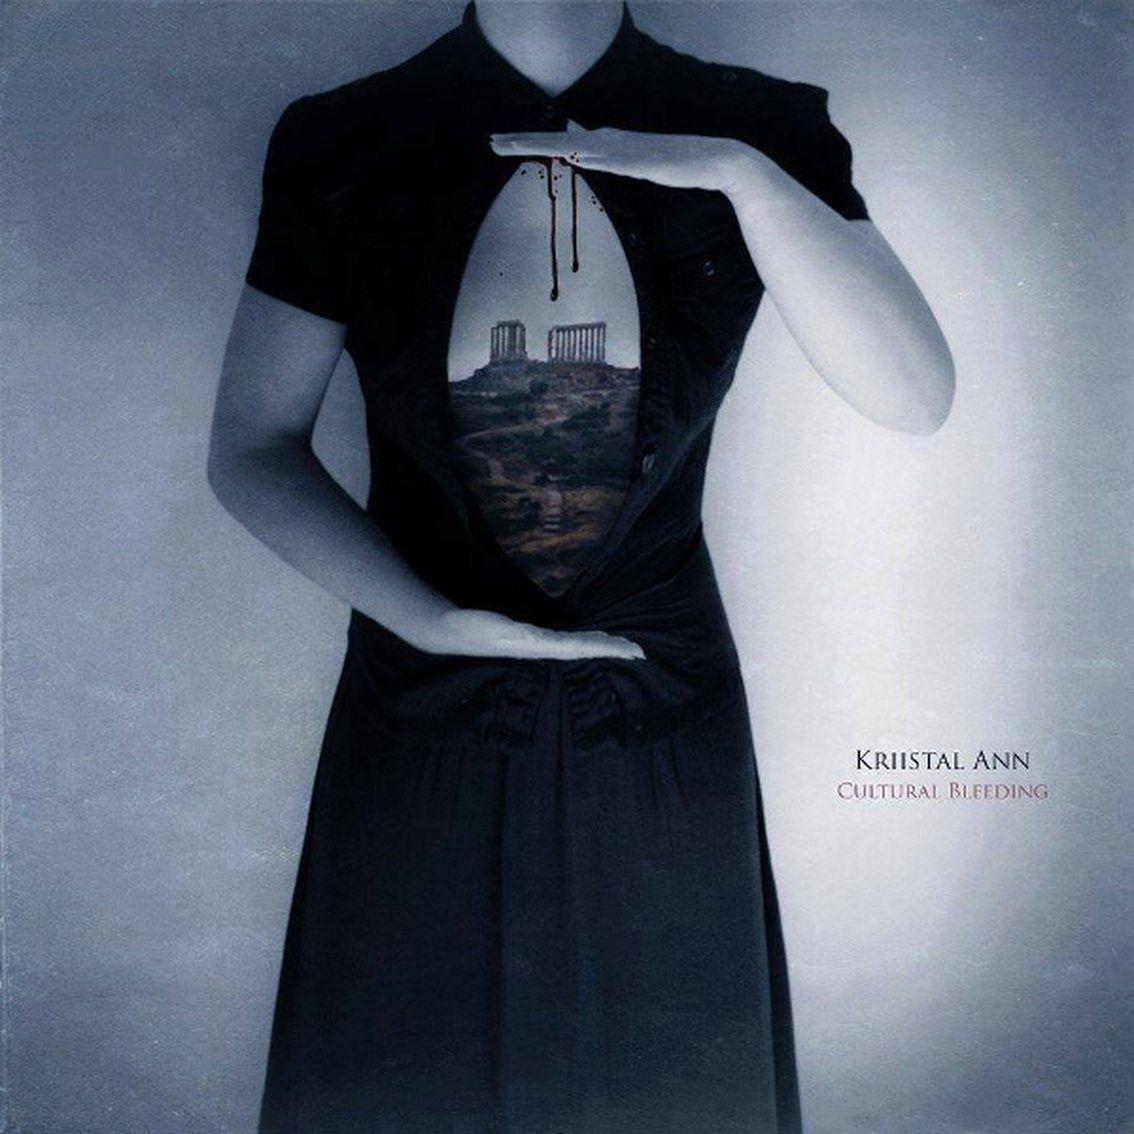 Minimal synth artist Kriistal Ann reissues splendid 'Cultural Bleeding' on vinyl in October - a must-have !